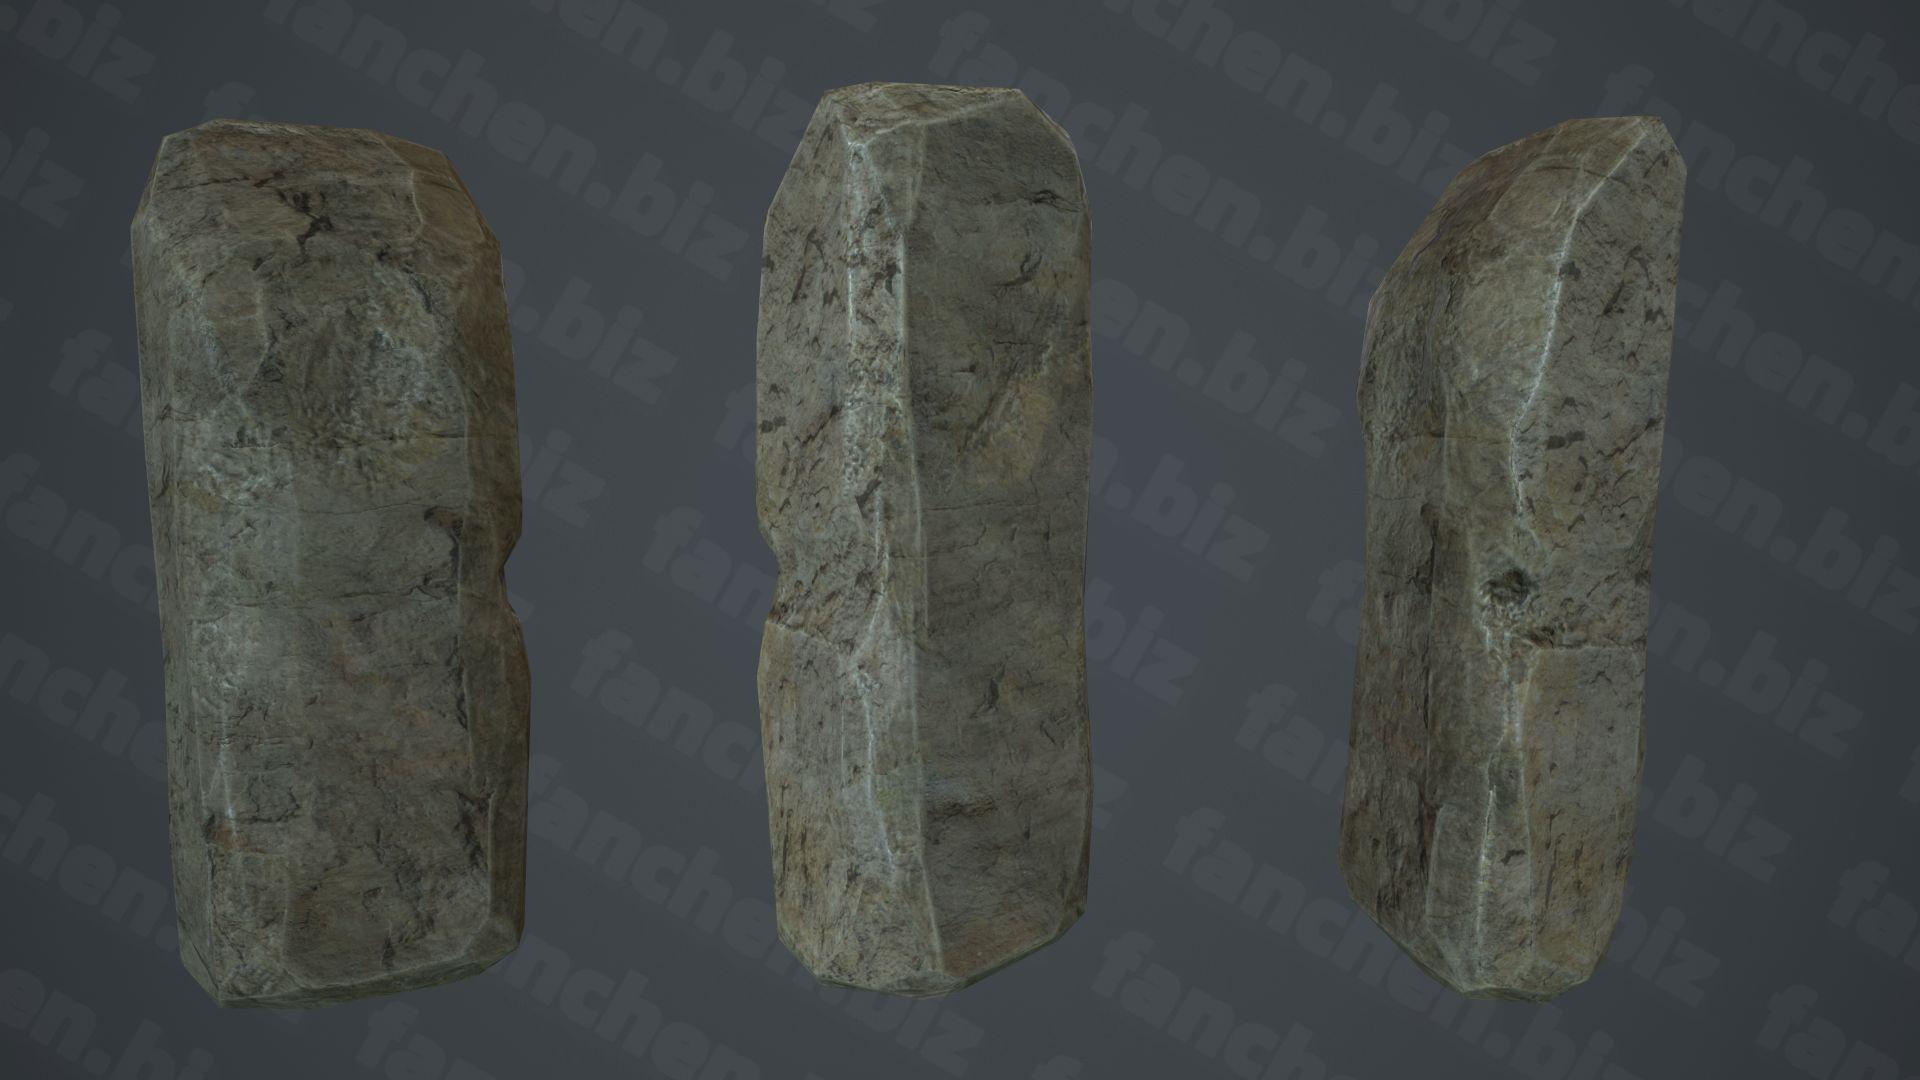 Polycount岩石类3D作品合集-FANCHENBIZ